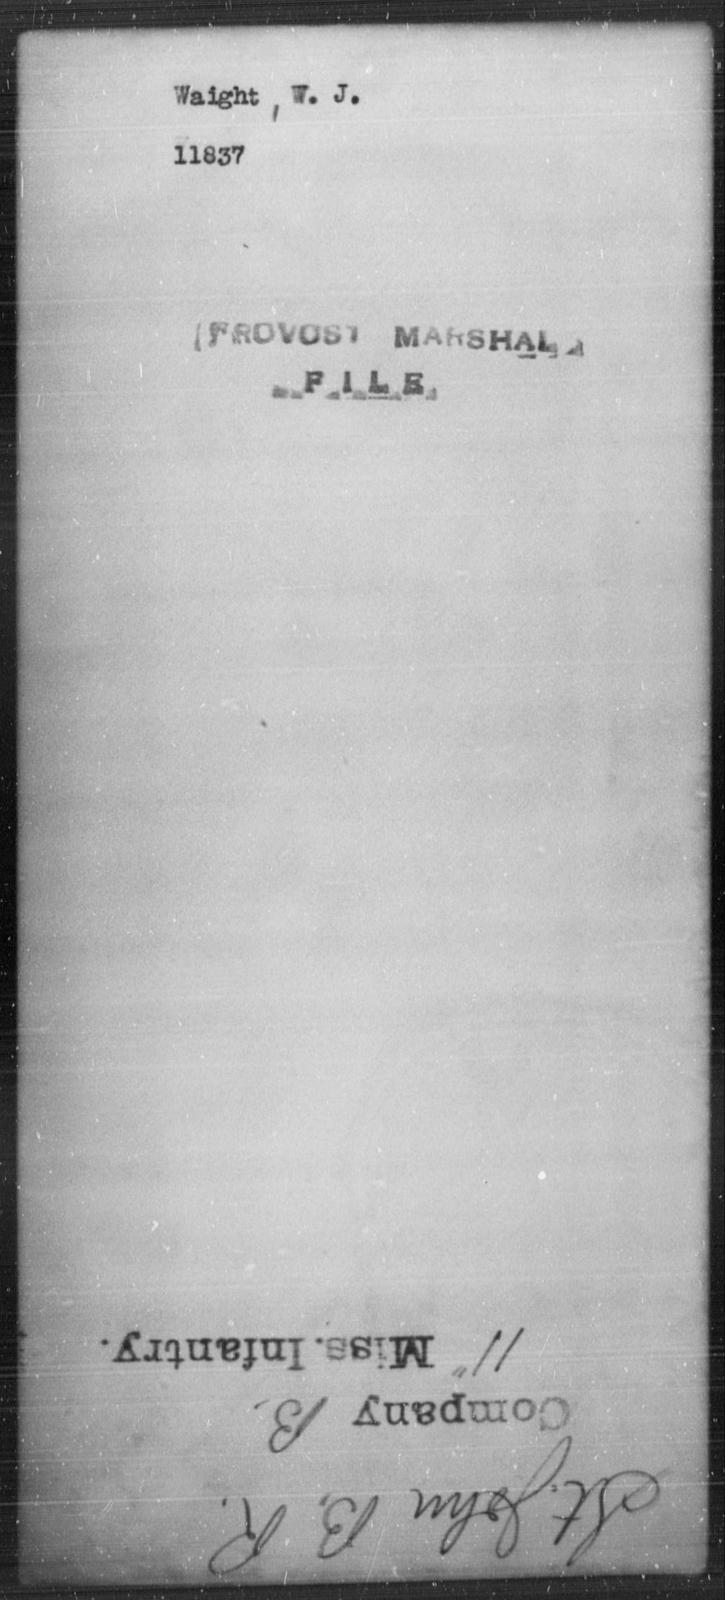 Waight, W J - State: [Blank] - Year: [Blank]